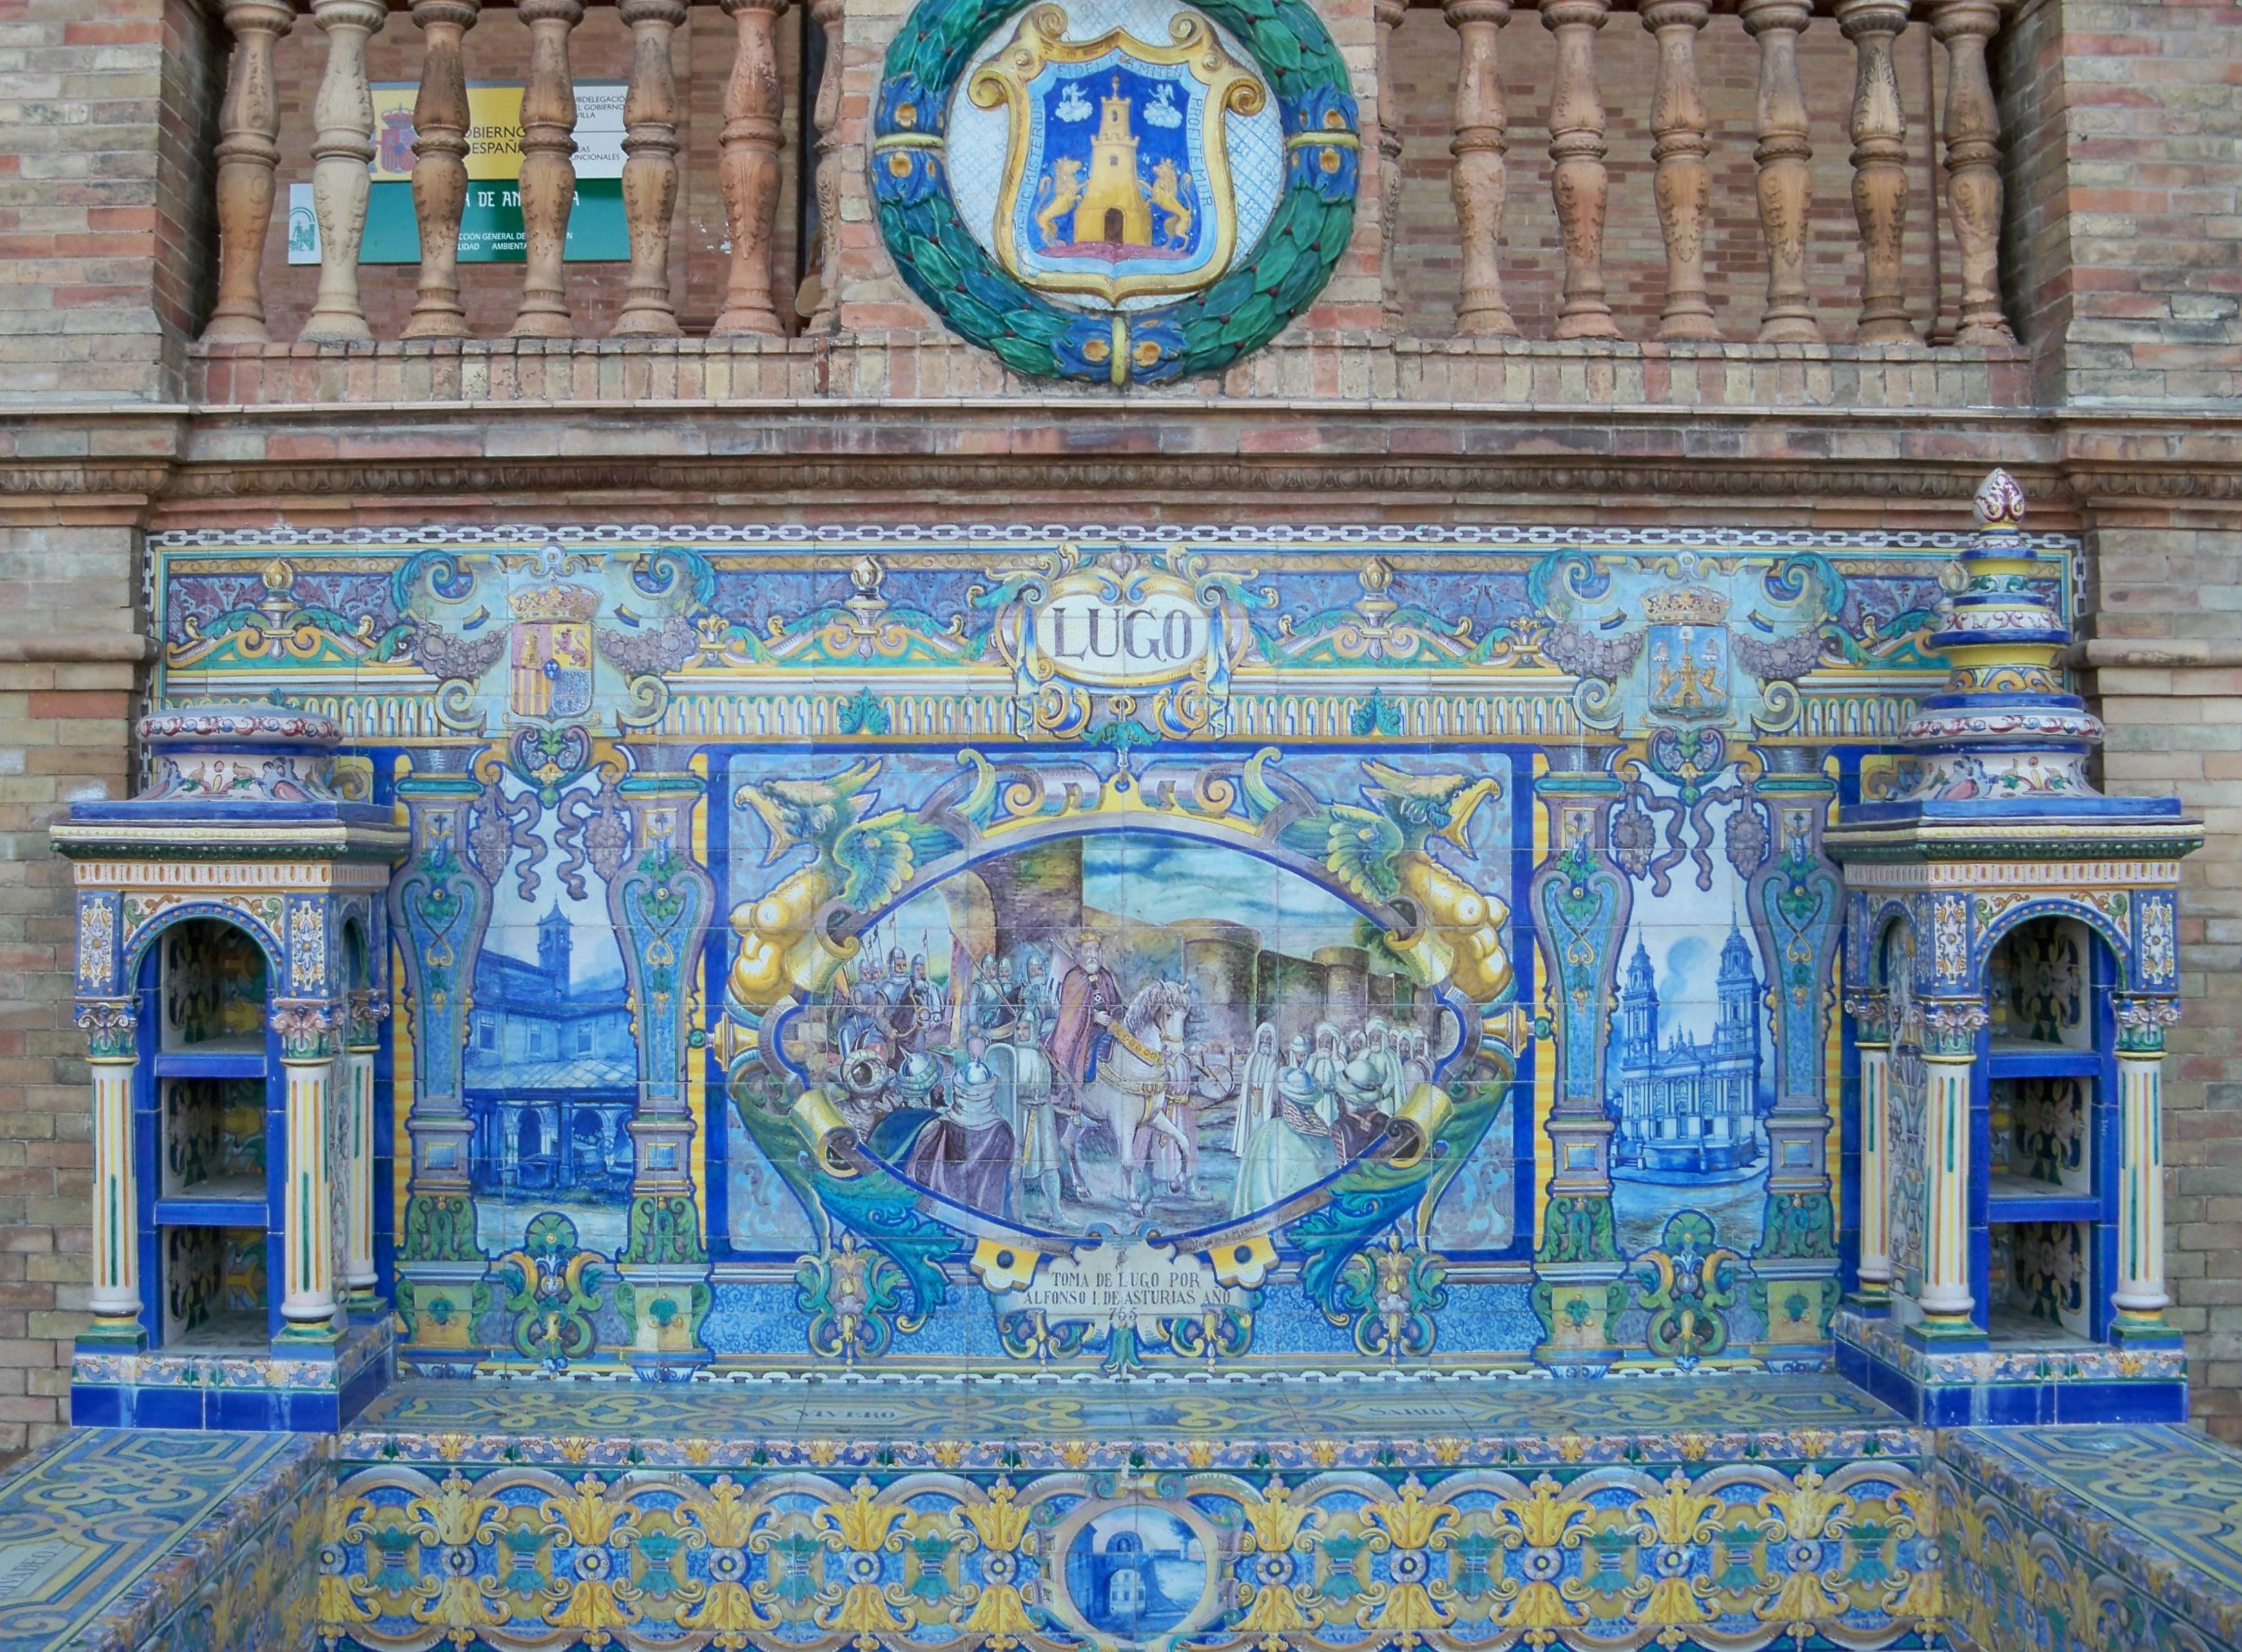 http://jardinesdelaoliva.files.wordpress.com/2011/11/vandalismo-anaquel-roto.jpg